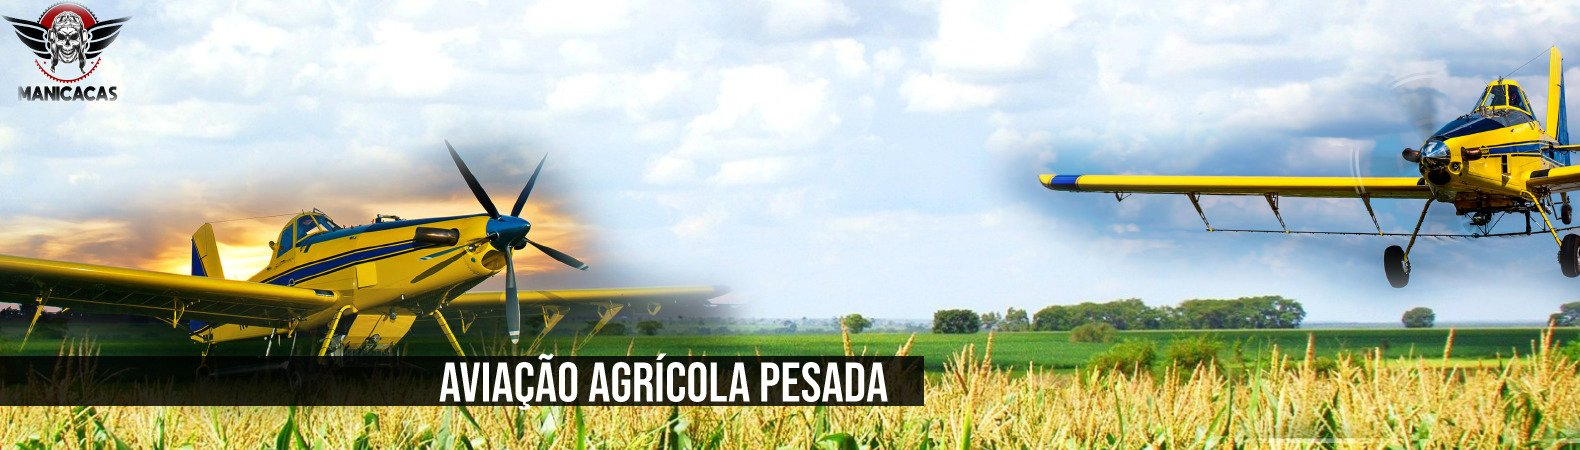 banner agricola